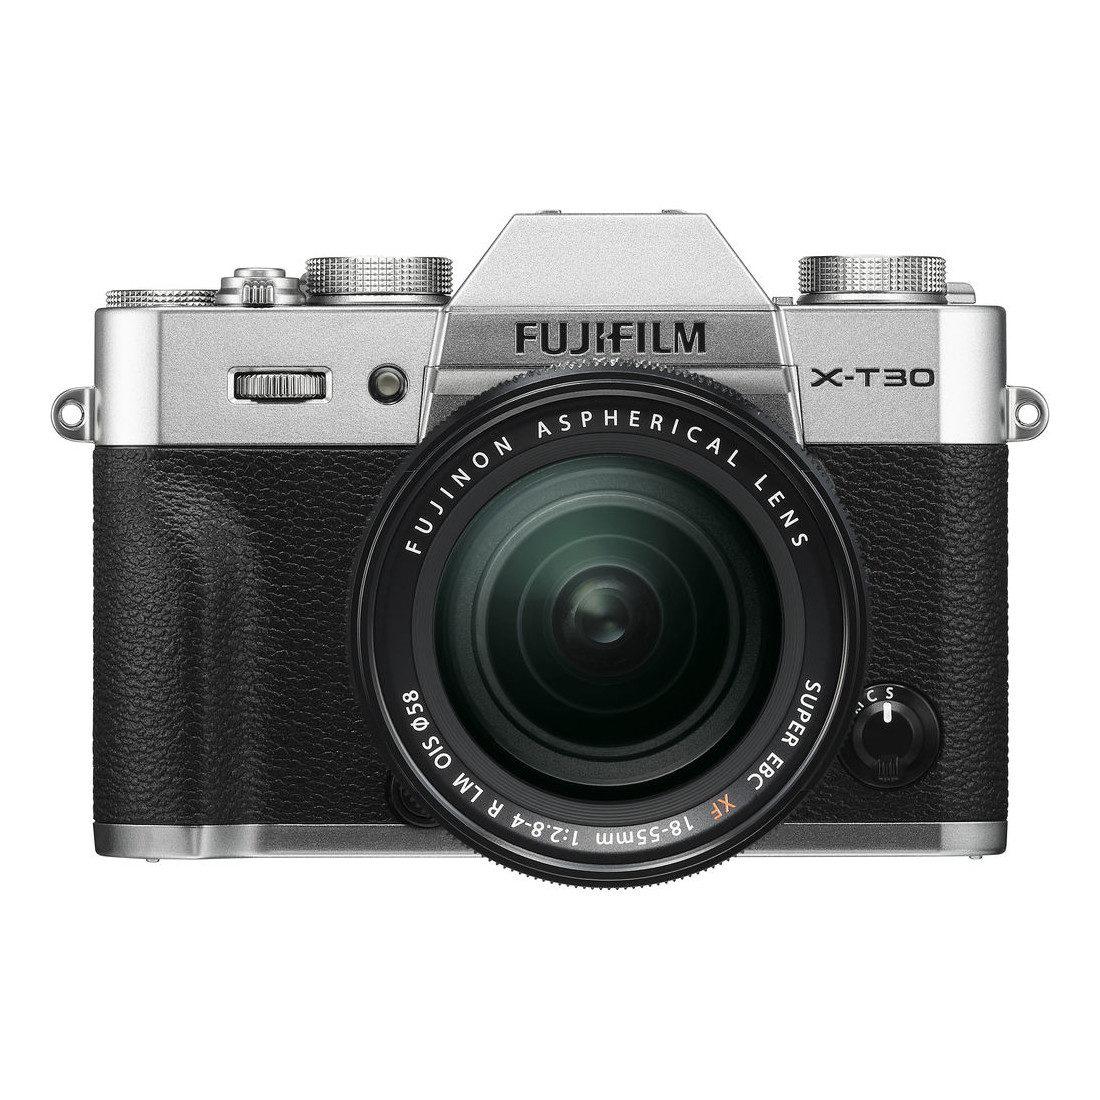 Fujifilm X-T30 systeemcamera Zilver + 18-55mm f/2.8-4.0 OIS <br/>€ 1249.00 <br/> <a href='https://www.cameranu.nl/fotografie/?tt=12190_474631_241358_&r=https%3A%2F%2Fwww.cameranu.nl%2Fnl%2Fp2949155%2Ffujifilm-x-t30-systeemcamera-zilver-18-55mm-f-2-8-4-0-ois%3Fchannable%3De10841.Mjk0OTE1NQ%26utm_campaign%3D%26utm_content%3DSysteemcamera%26utm_source%3DTradetracker%26utm_medium%3Dcpc%26utm_term%3DDigitale%2Bcamera%26apos%3Bs' target='_blank'>naar de winkel</a>